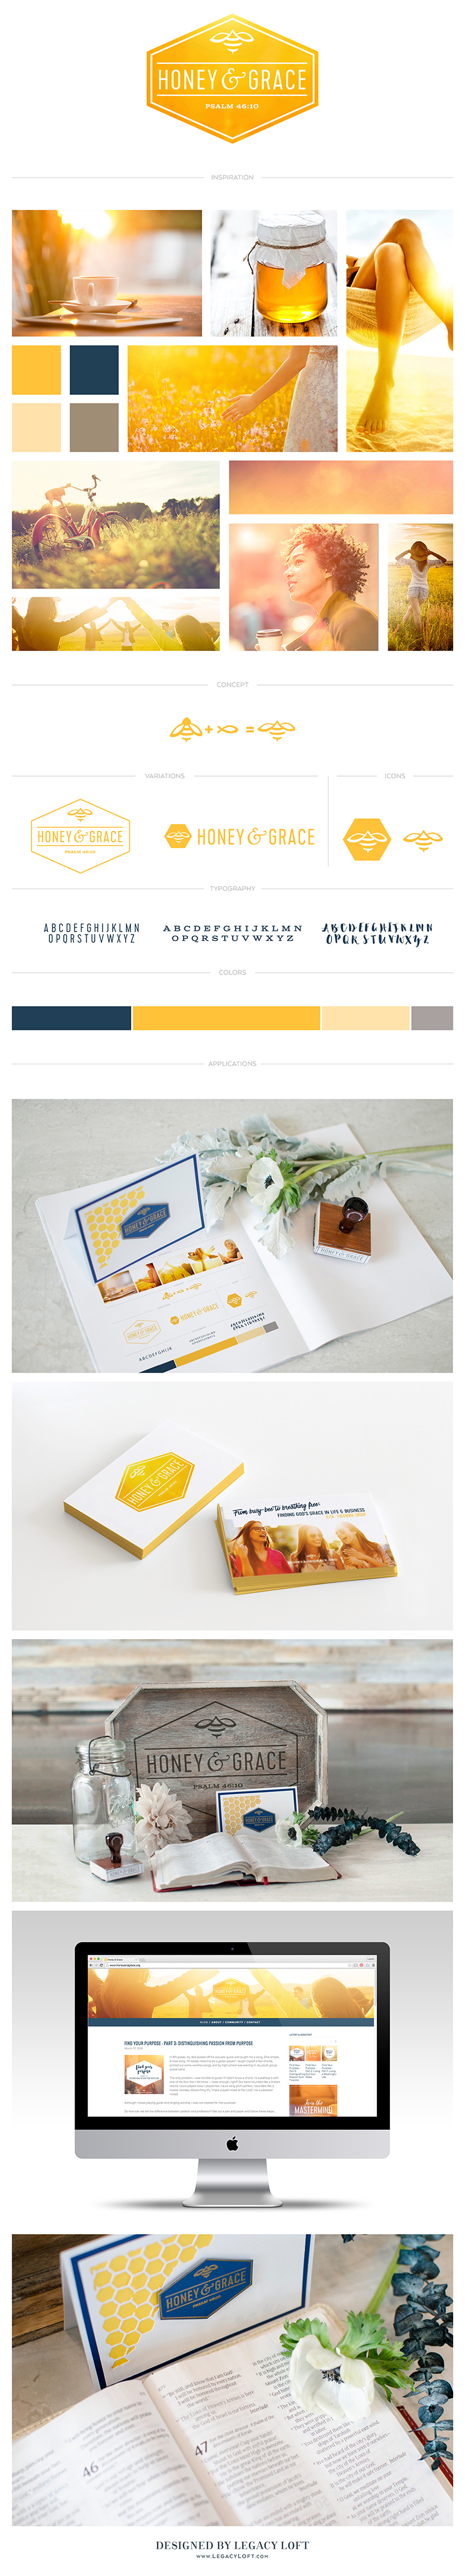 honey-and-grace-blog-christian-branding-graphic-design